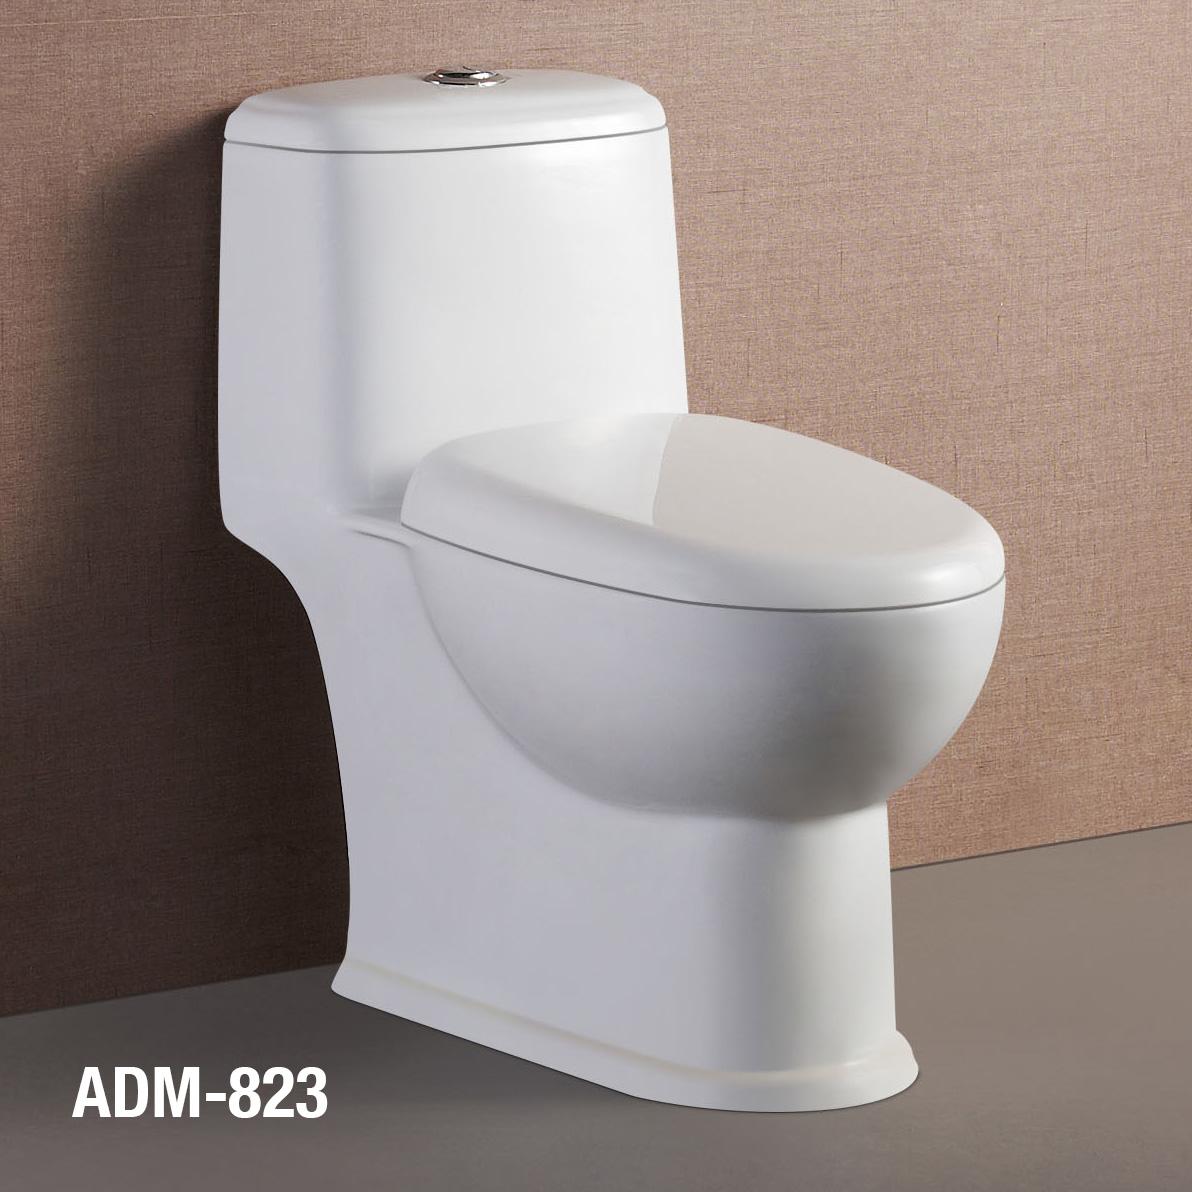 ADM-823 (3).jpg